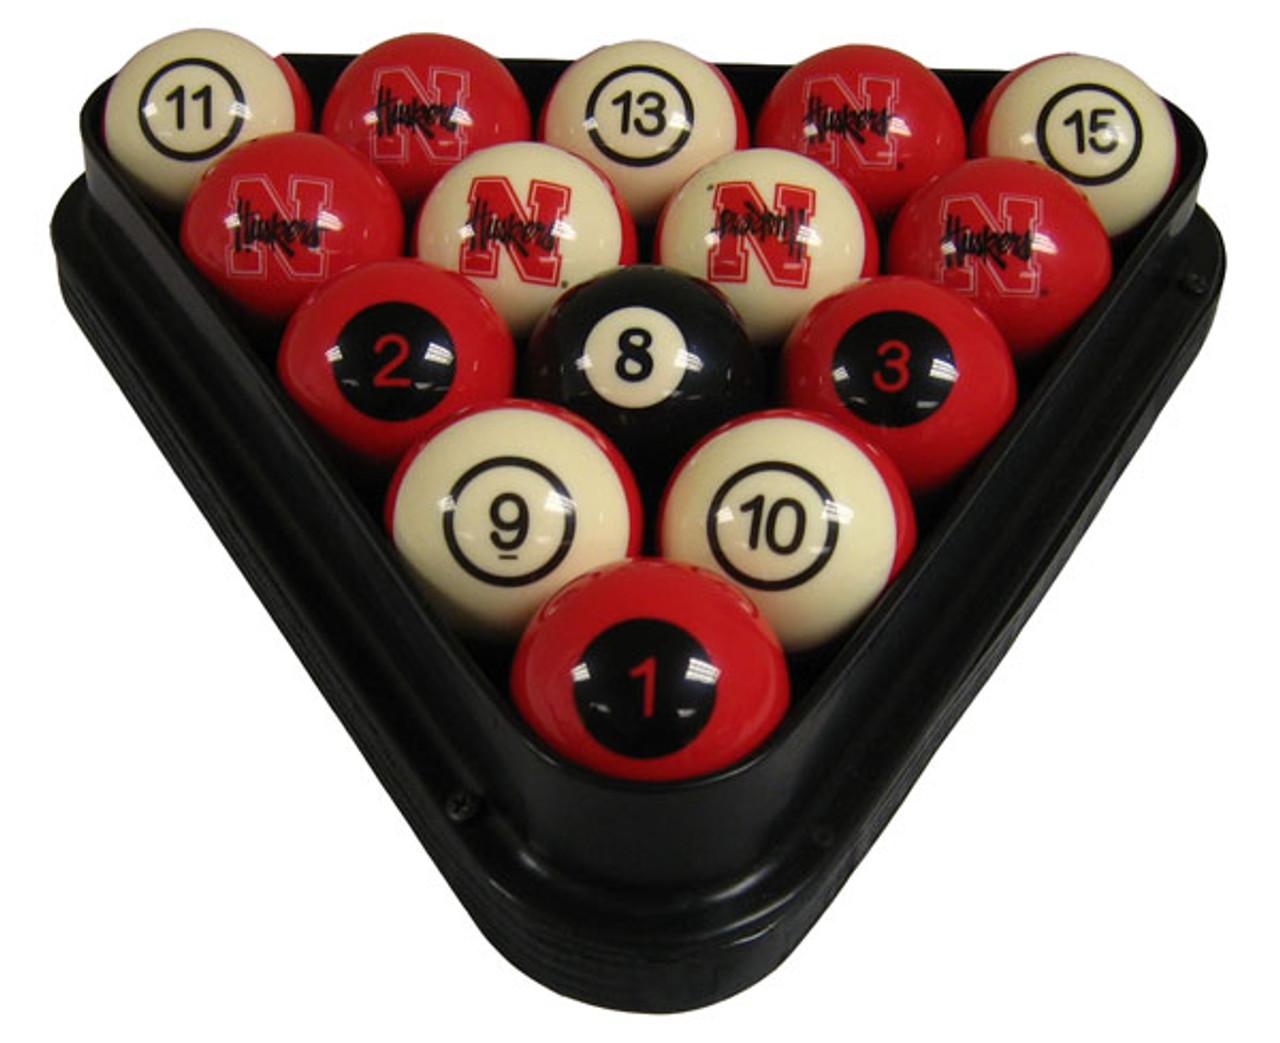 Nebraska Cornhuskers Numbered Billiard Ball Set